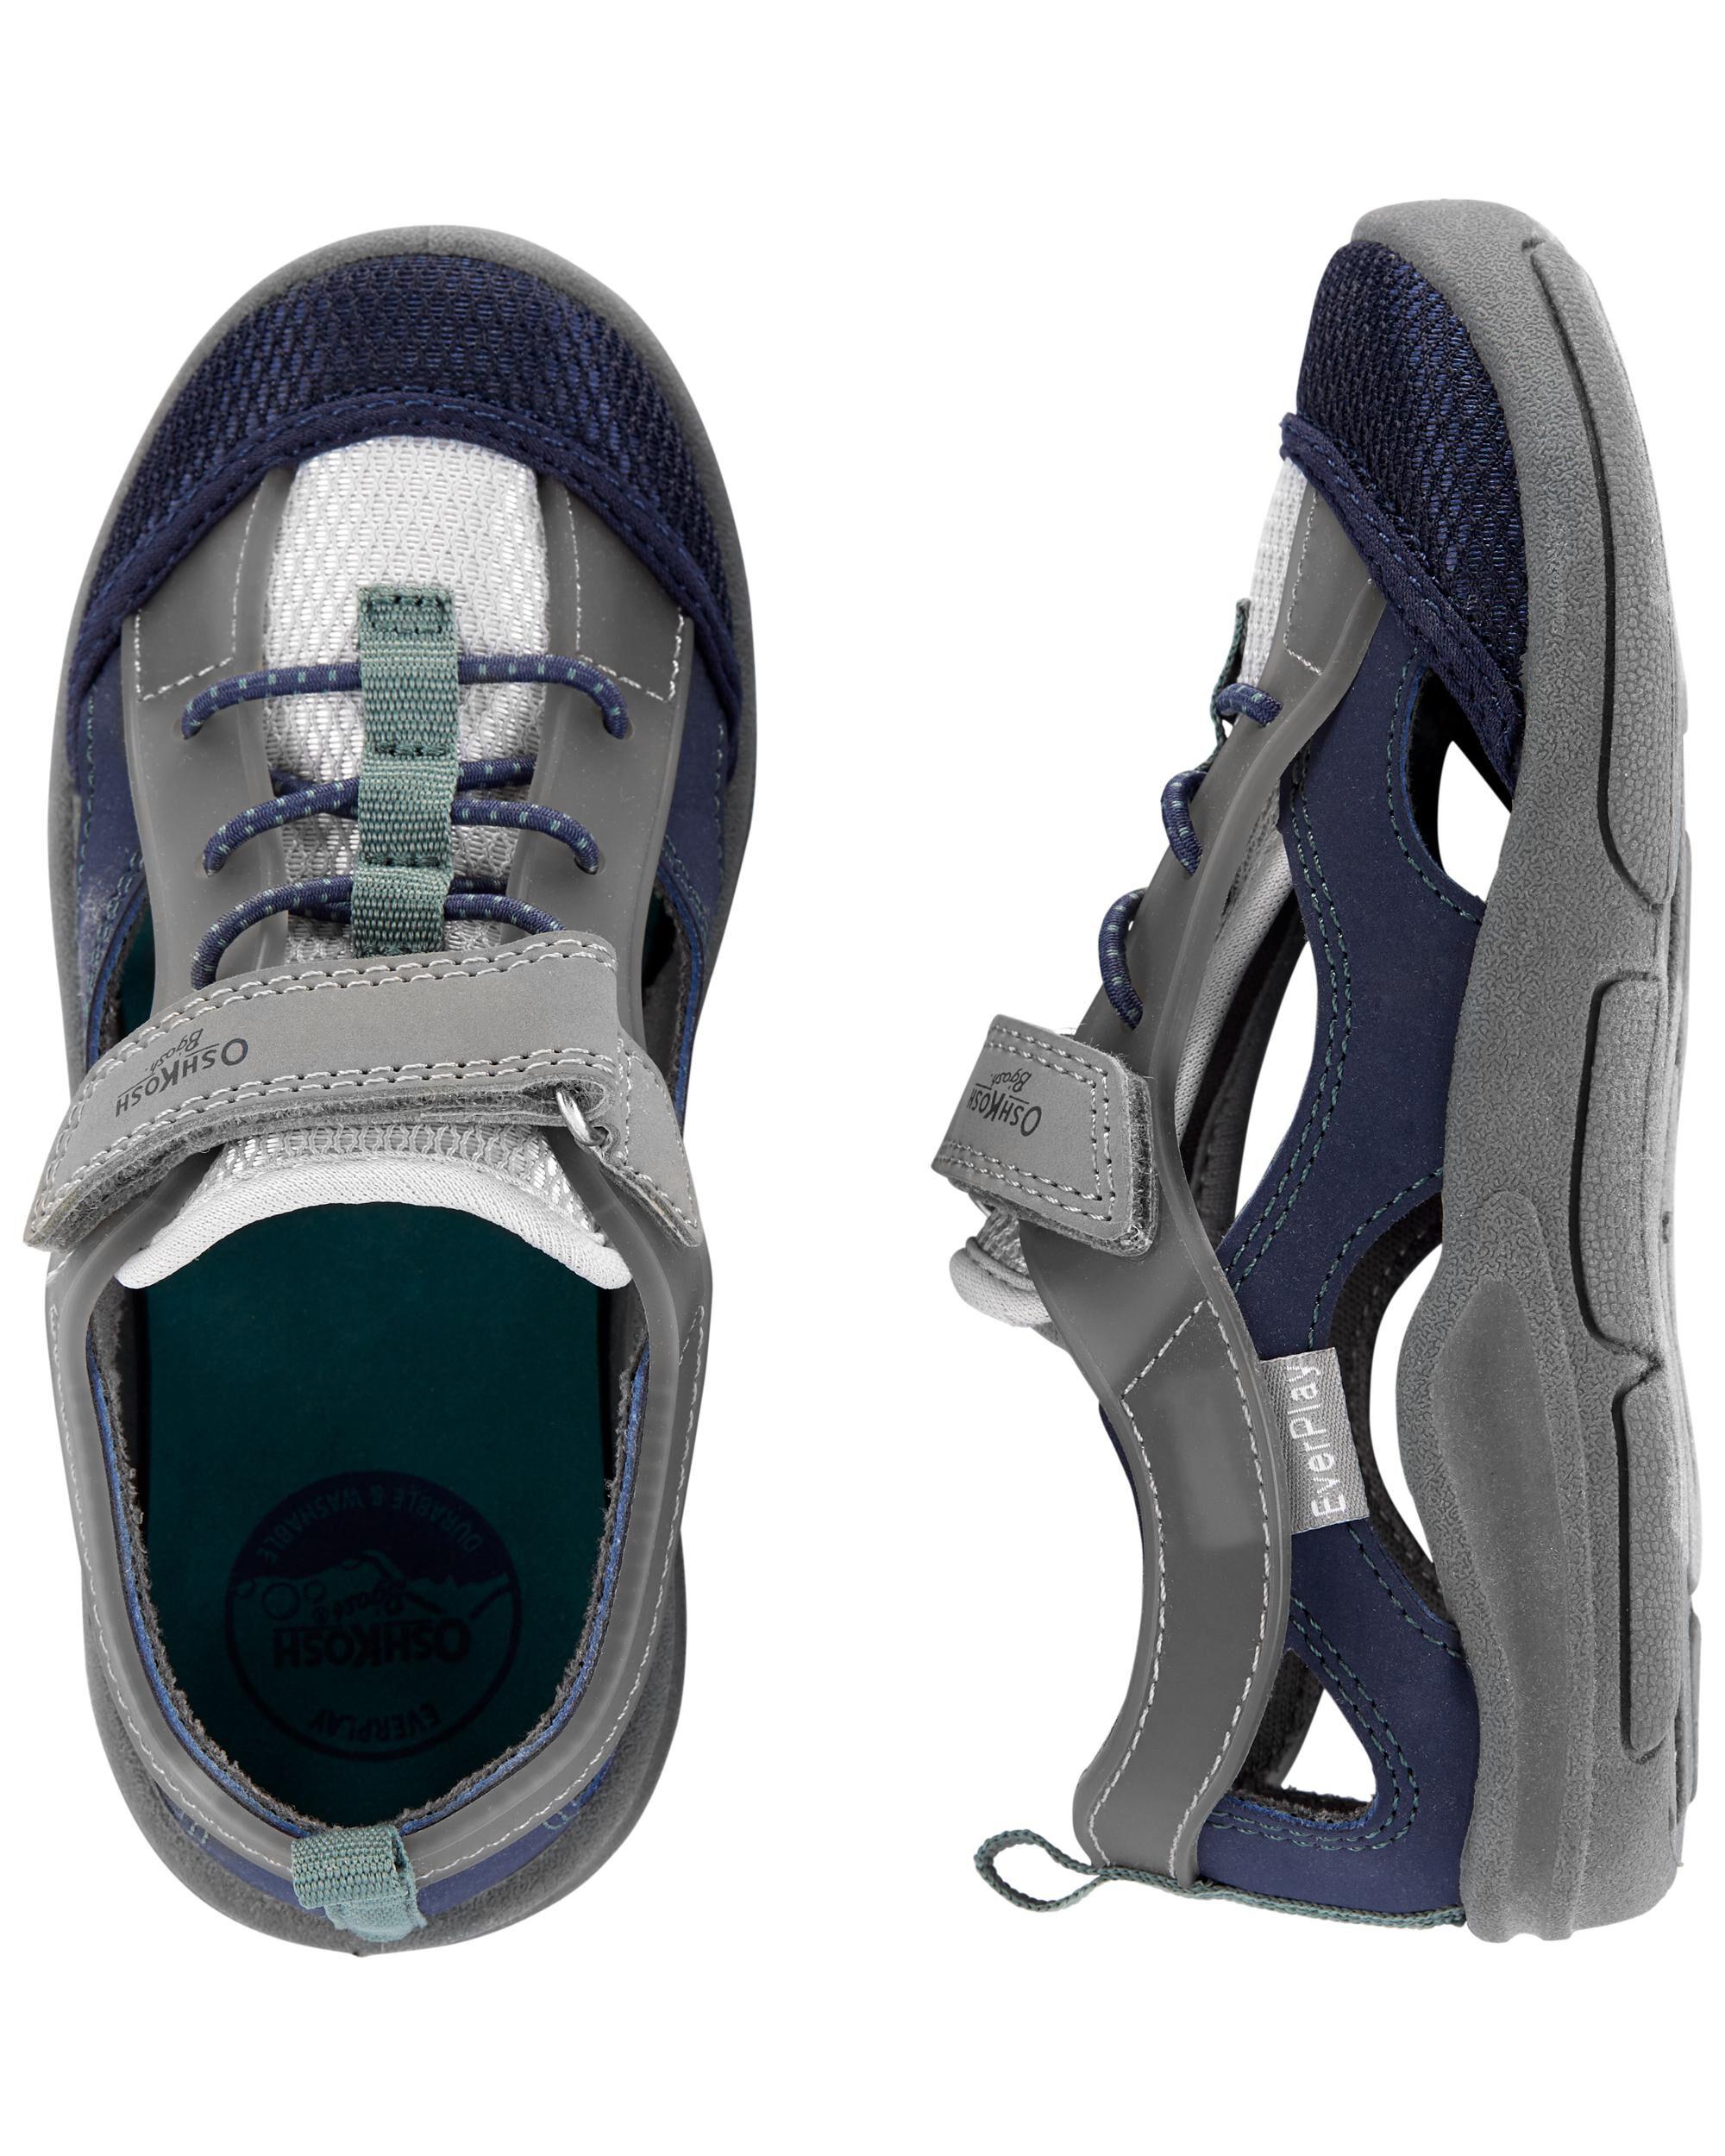 Carters EverPlay Closed-Heel Sandals